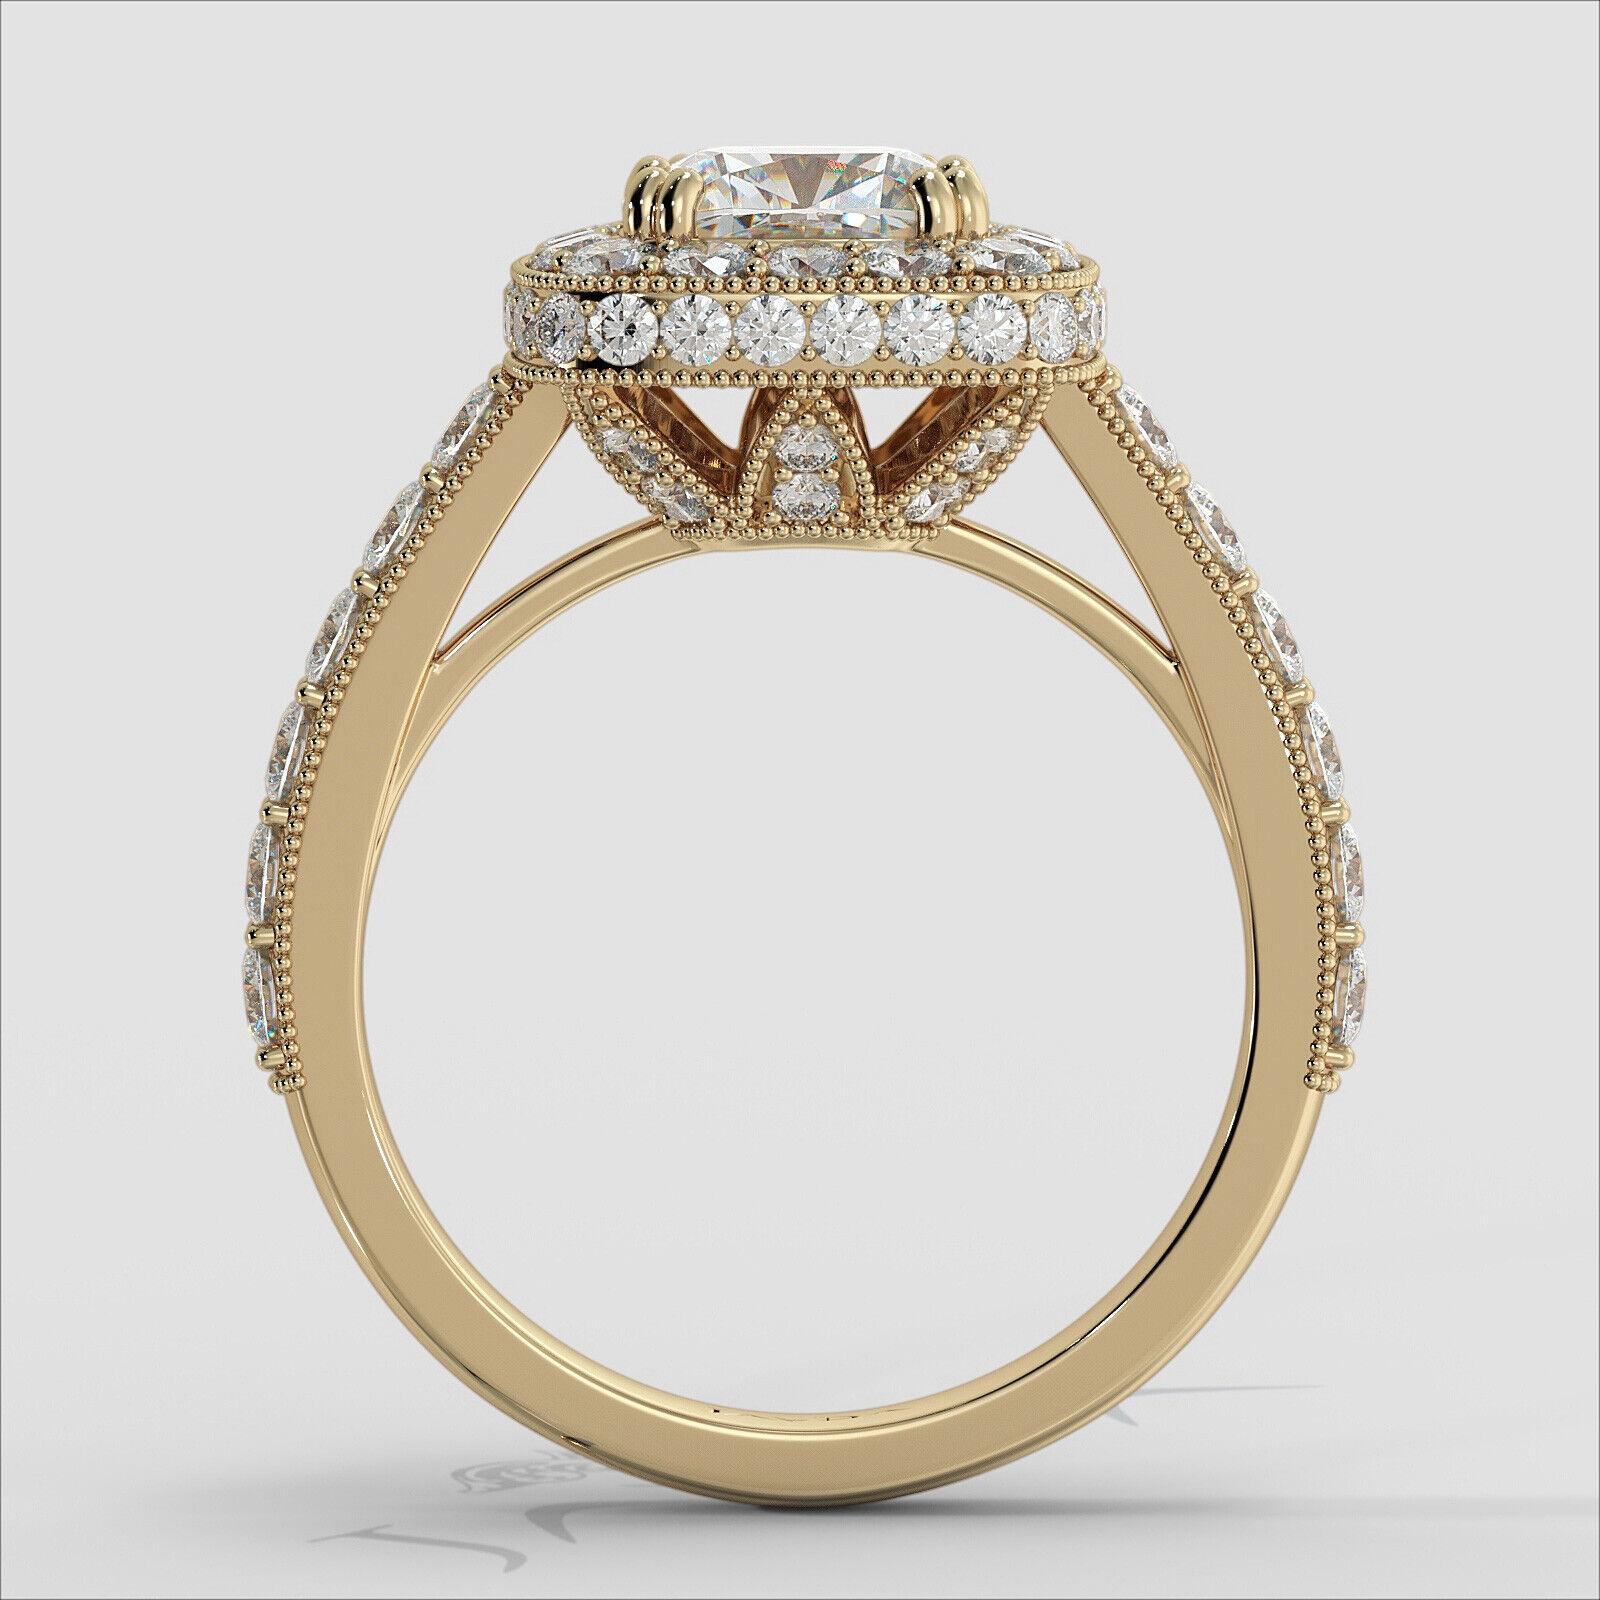 2ctw Milgrain Halo Floral Basket Cushion Diamond Engagement Ring GIA H-VS2 Gold 10